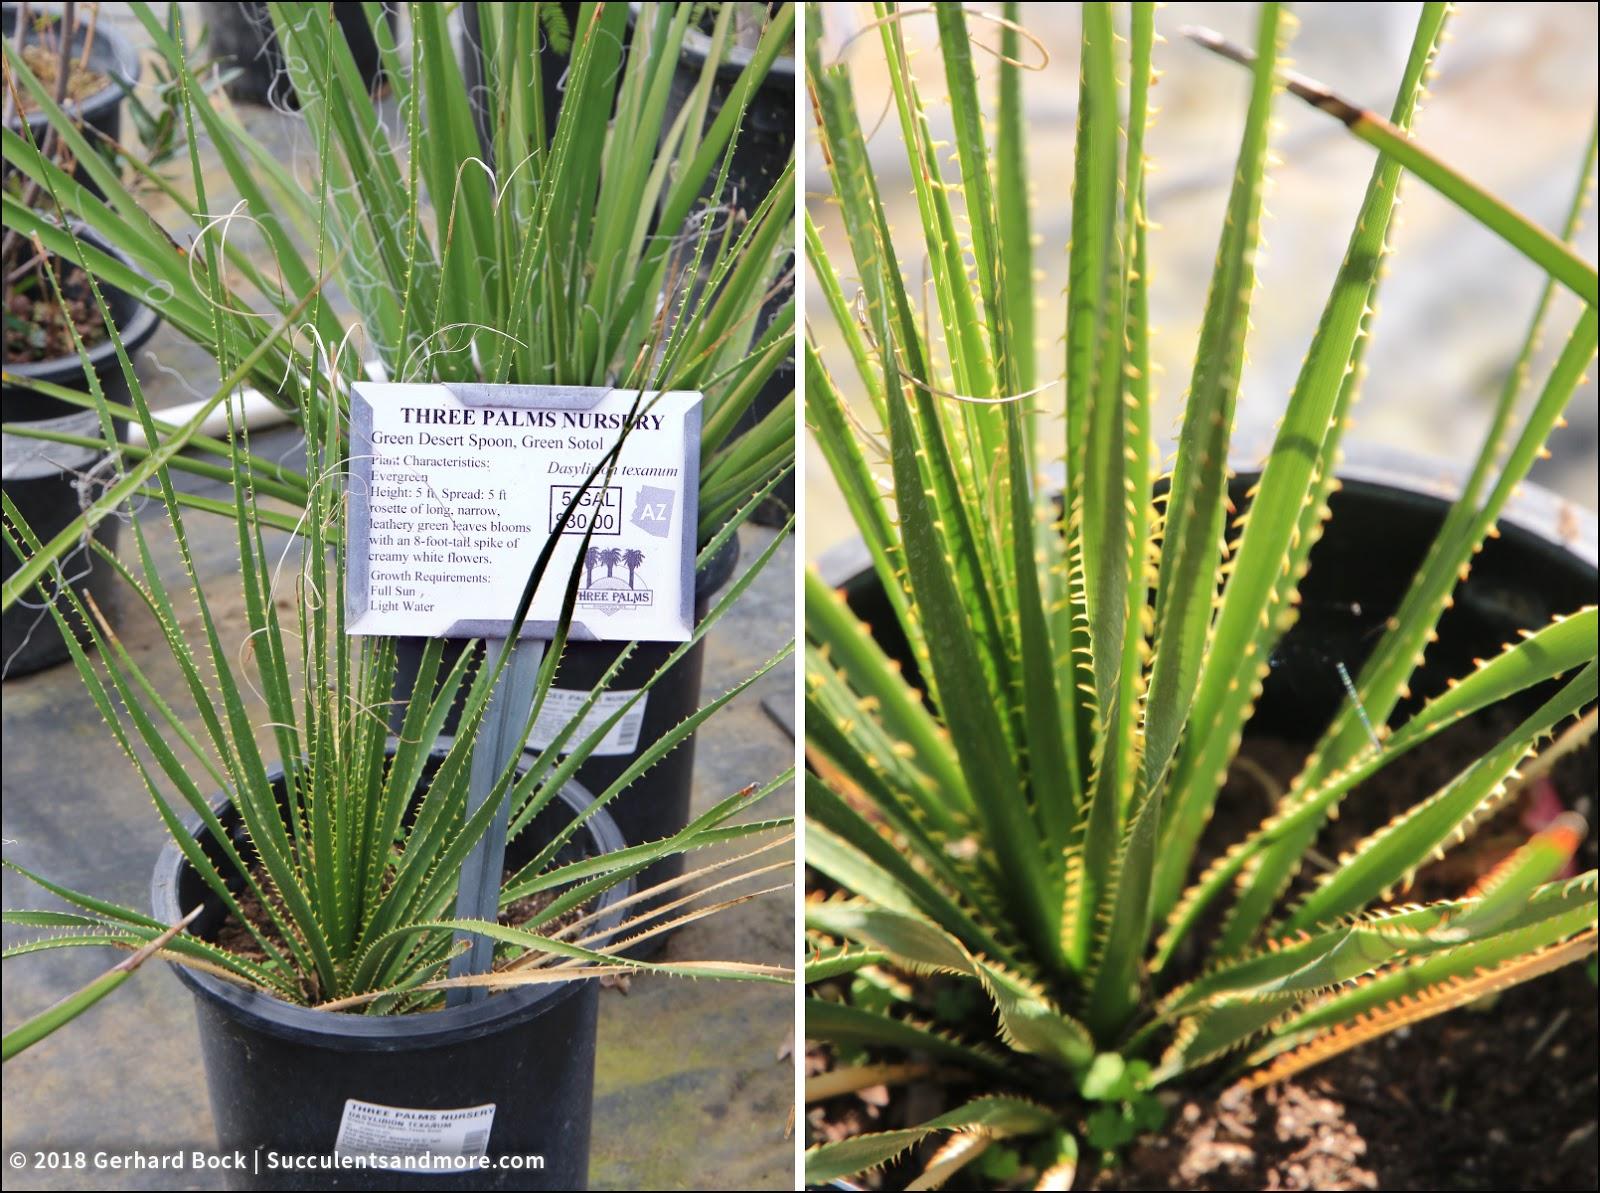 Dasylirion Texanum A Greener Version Of The More Common Desert Spoon D Wheeleri